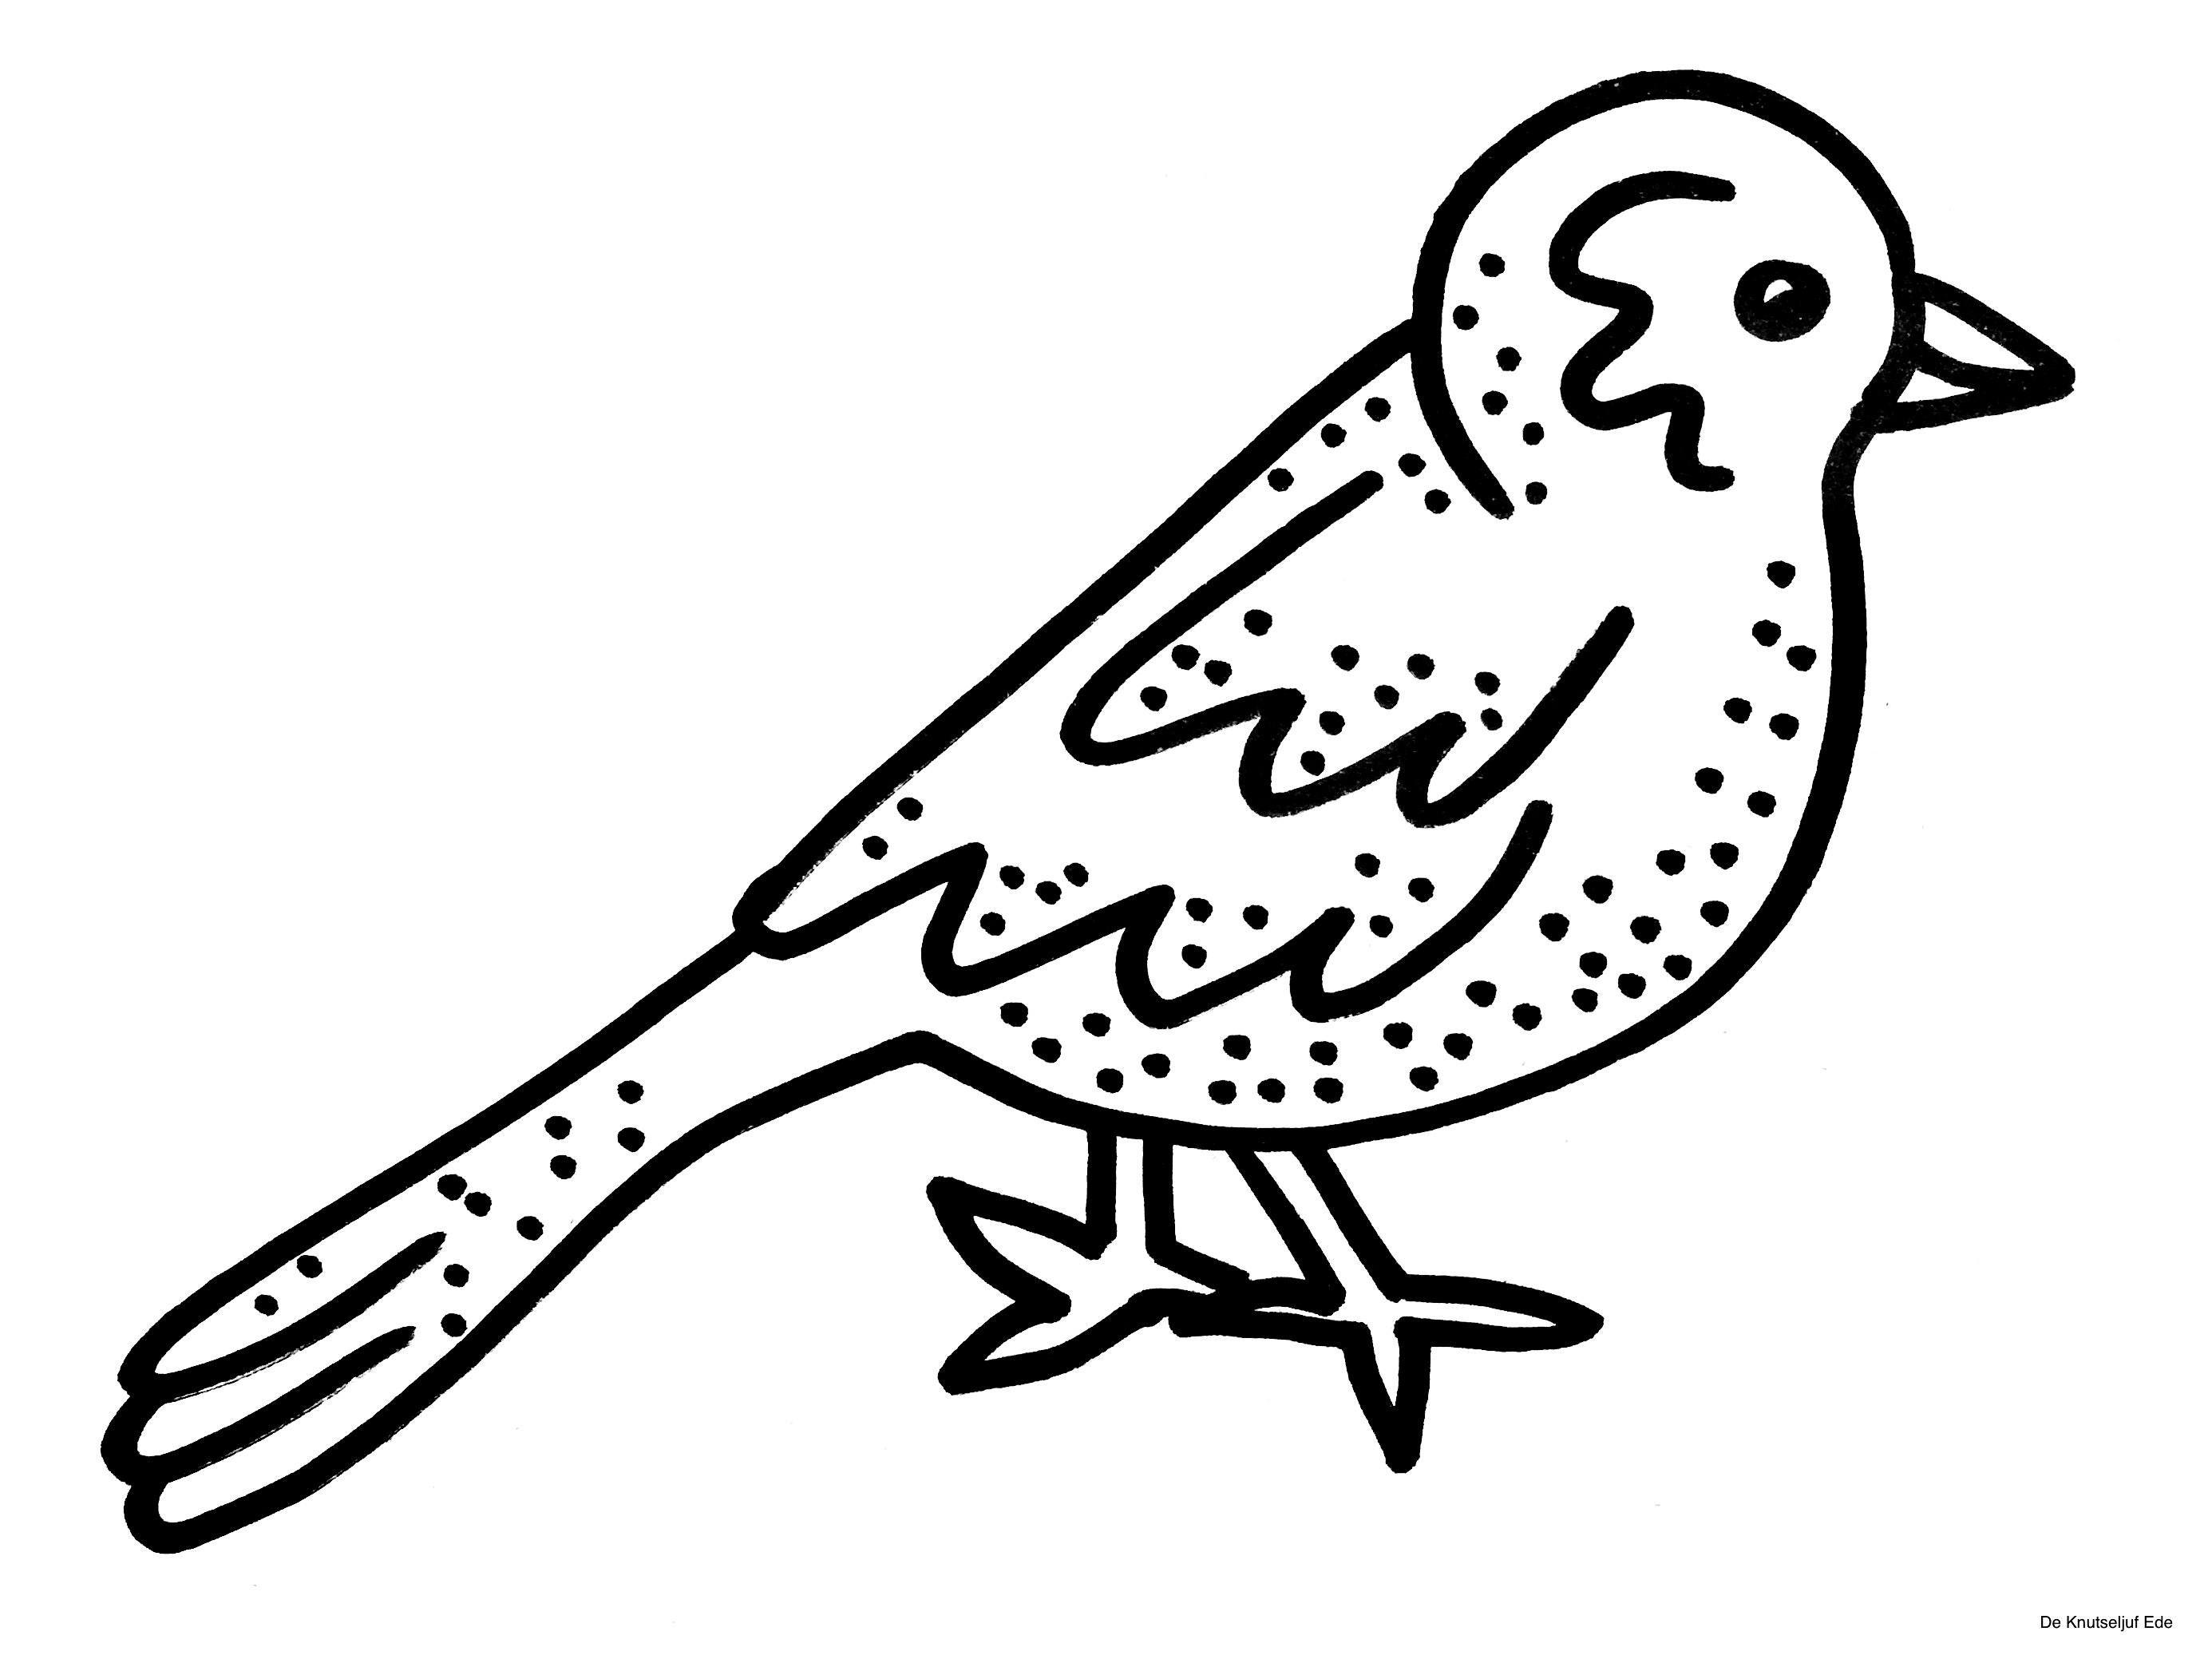 Kleurplaten Vogels.Kleurplaten Vogels Kleurplaten Kleurplaten Vogels Kleurplaat